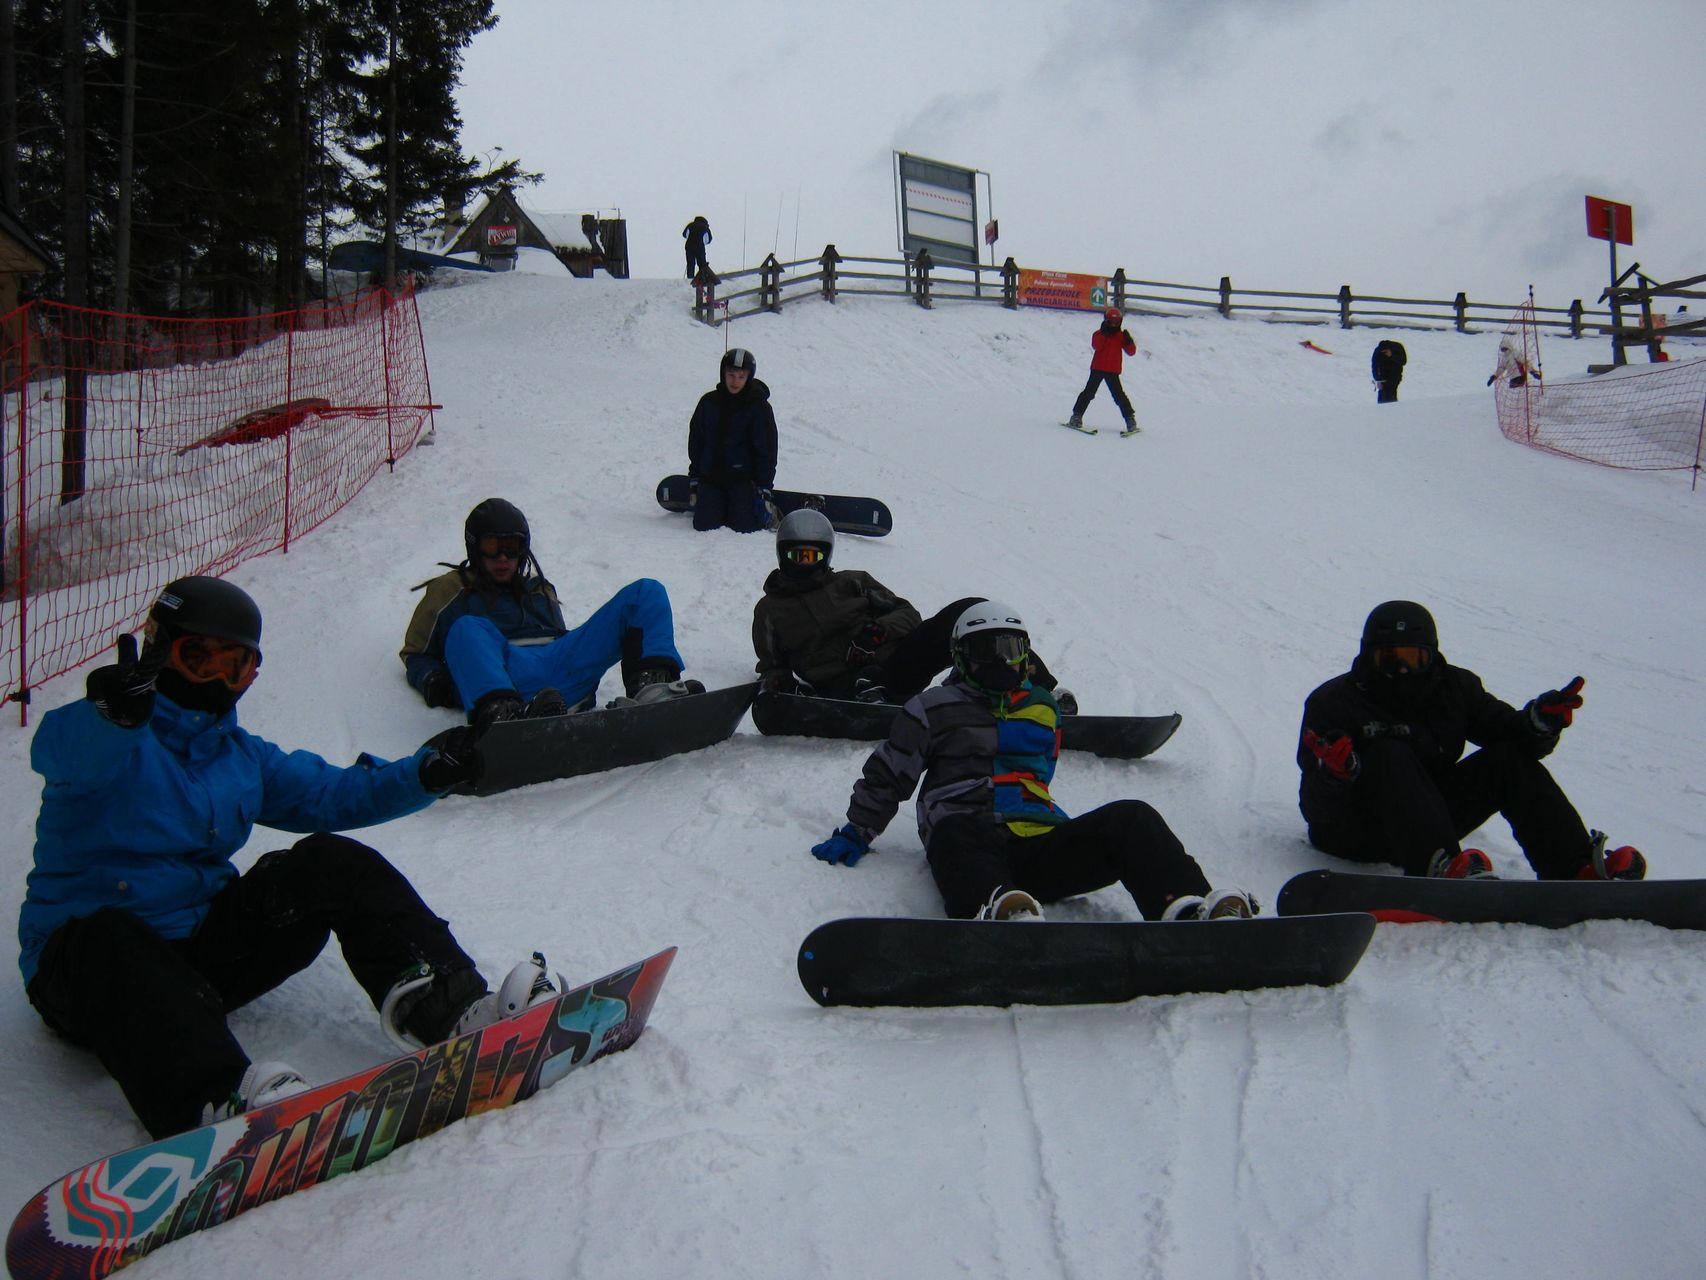 CarTourist_narty-snowboard_2012-foto-17